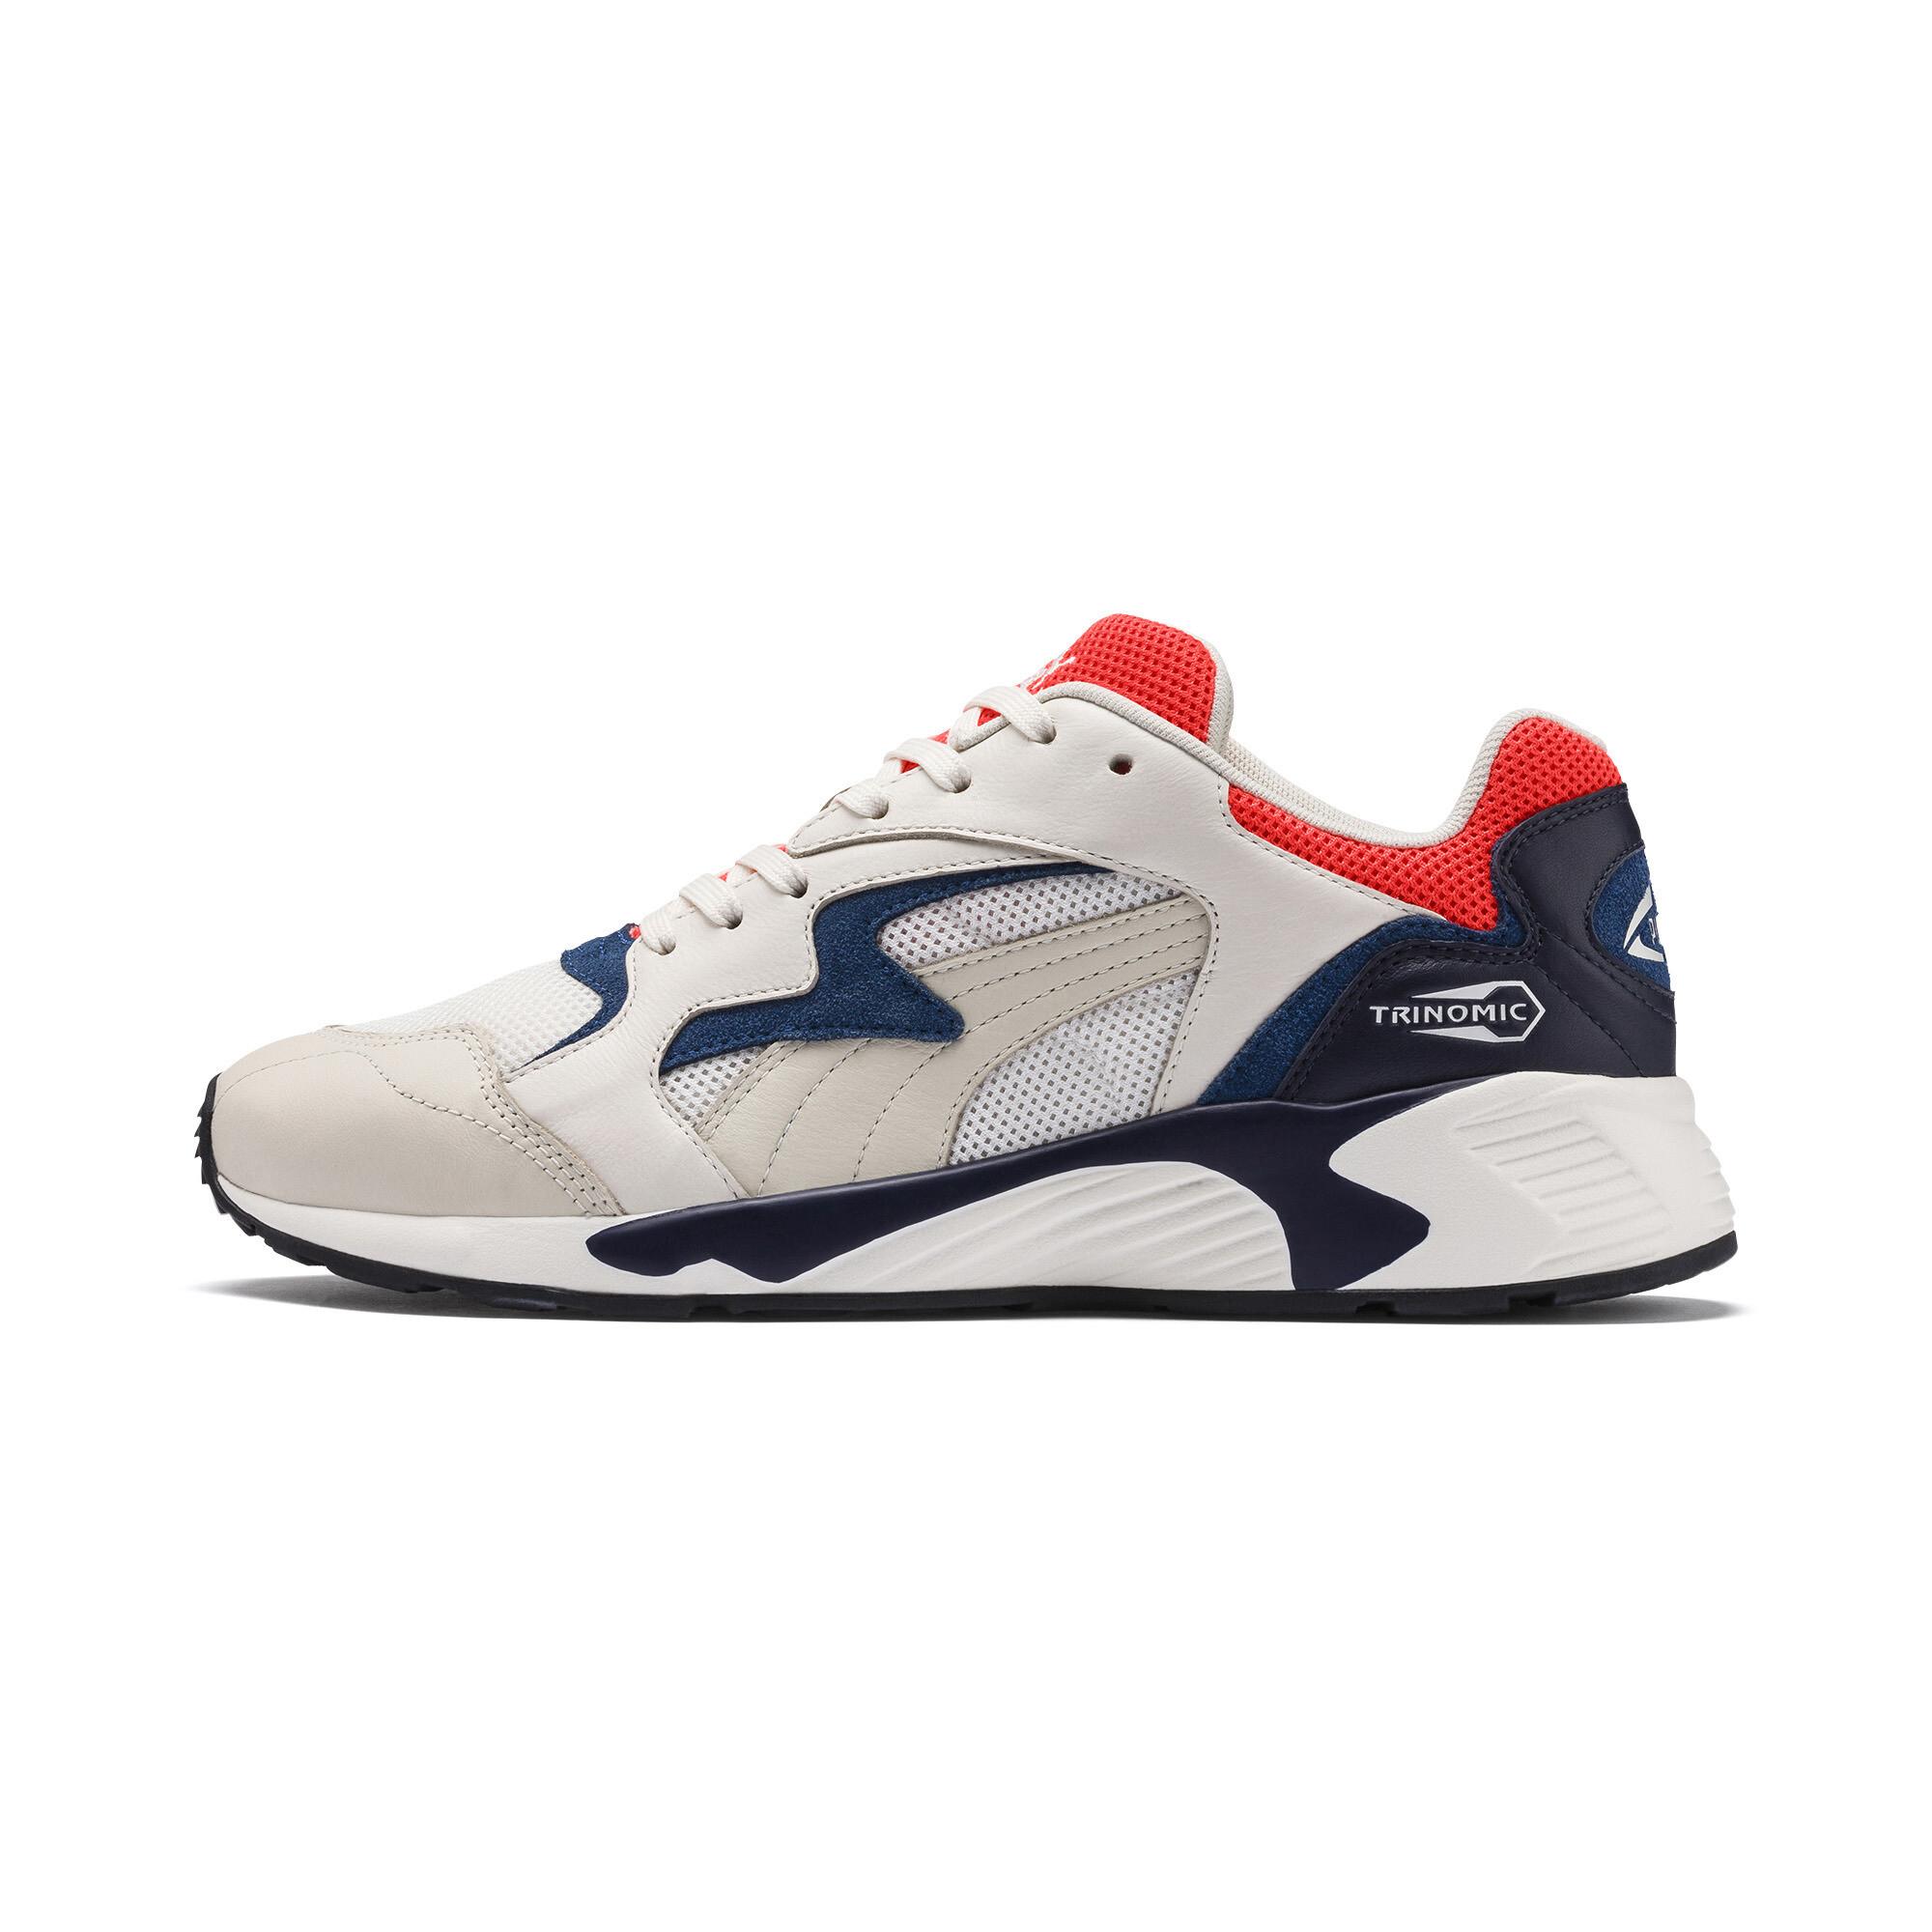 PUMA-Prevail-Classic-Sneakers-Unisex-Shoe thumbnail 4